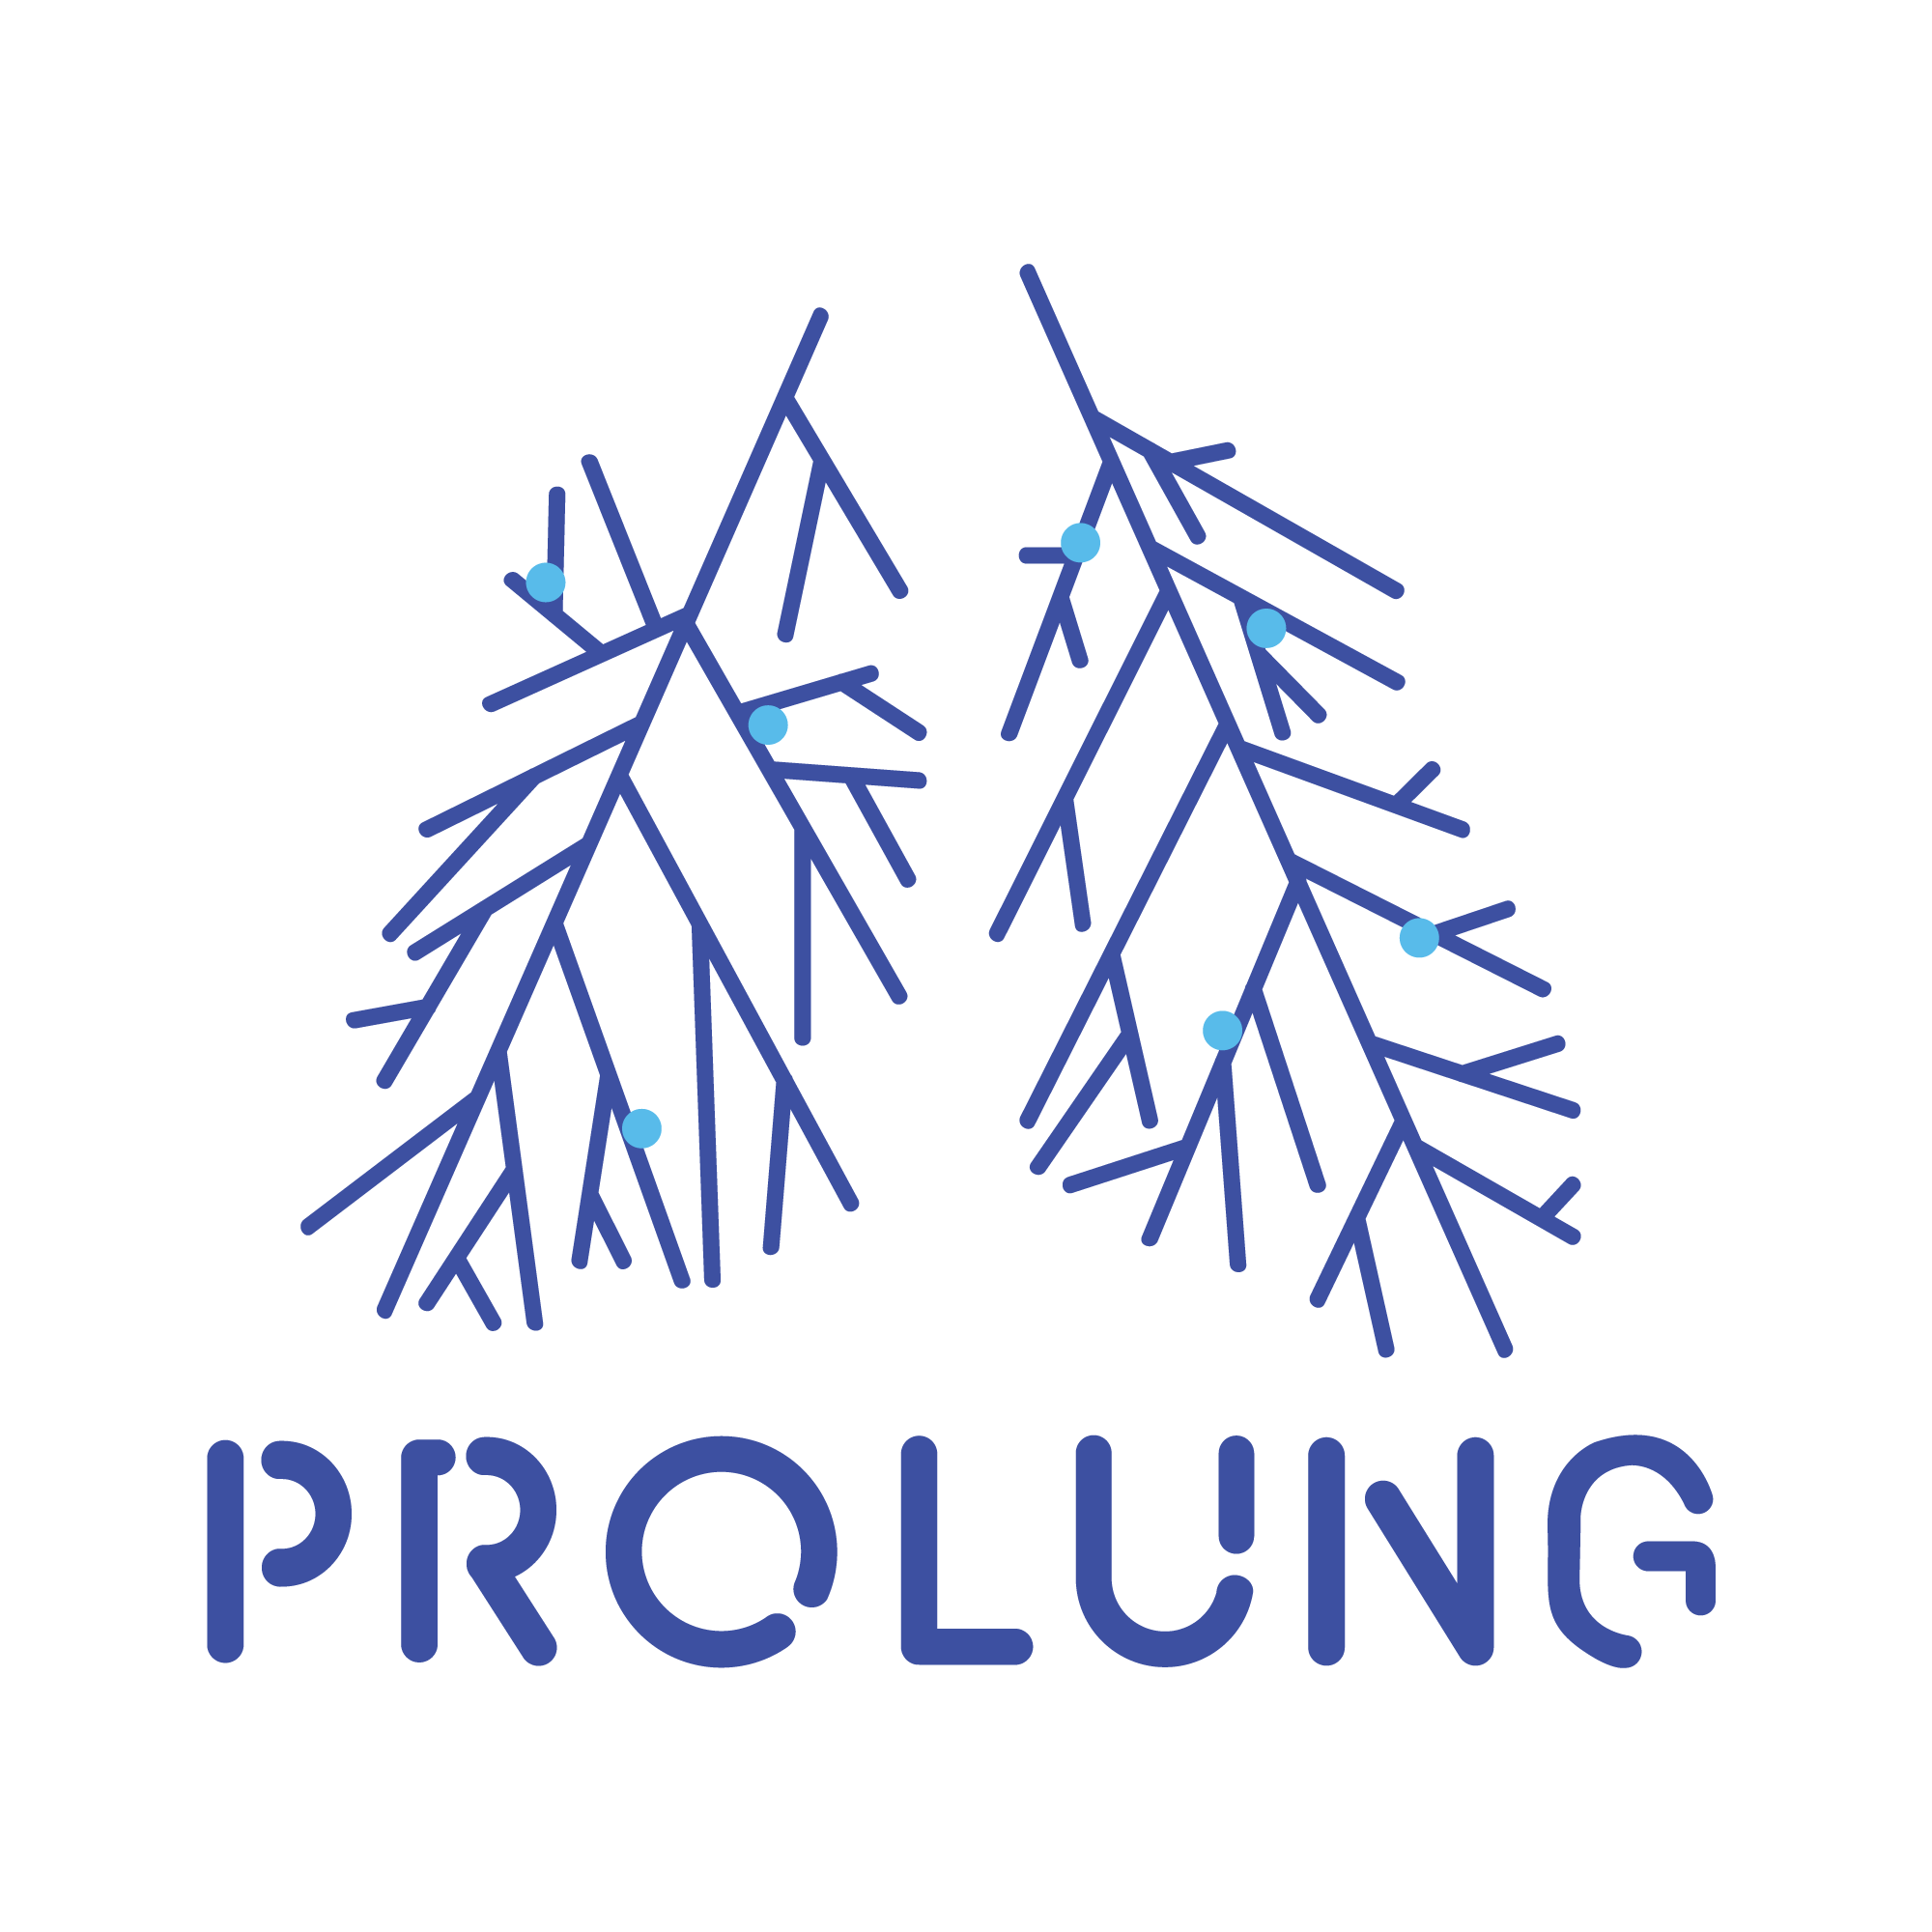 prolung-white